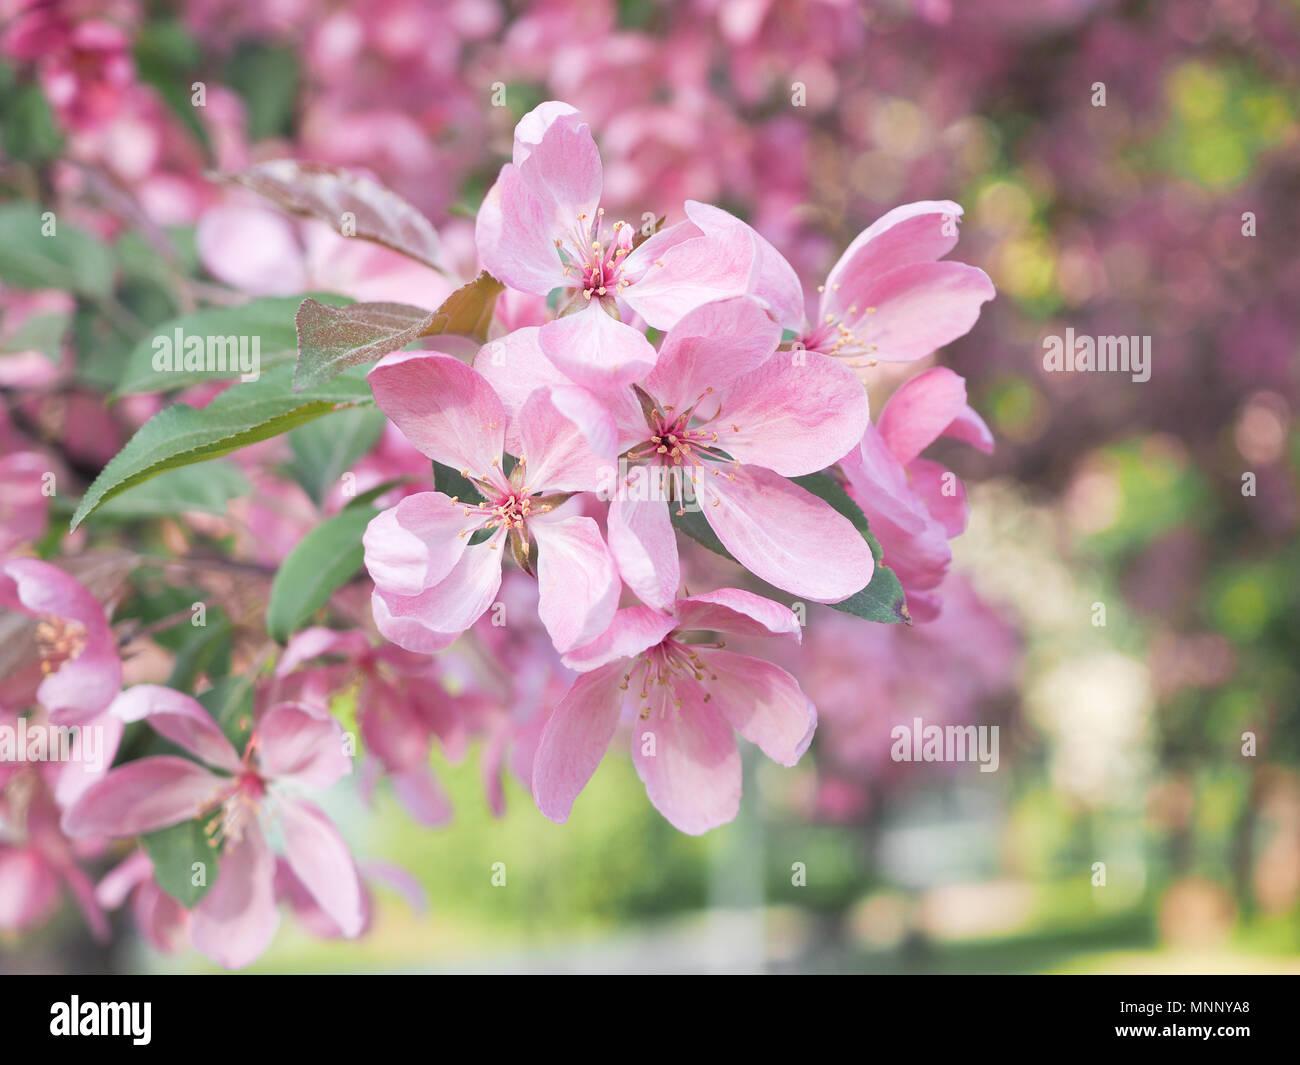 Beautiful And Rare Pink Apple Flowers Macro Stock Photo 185493904